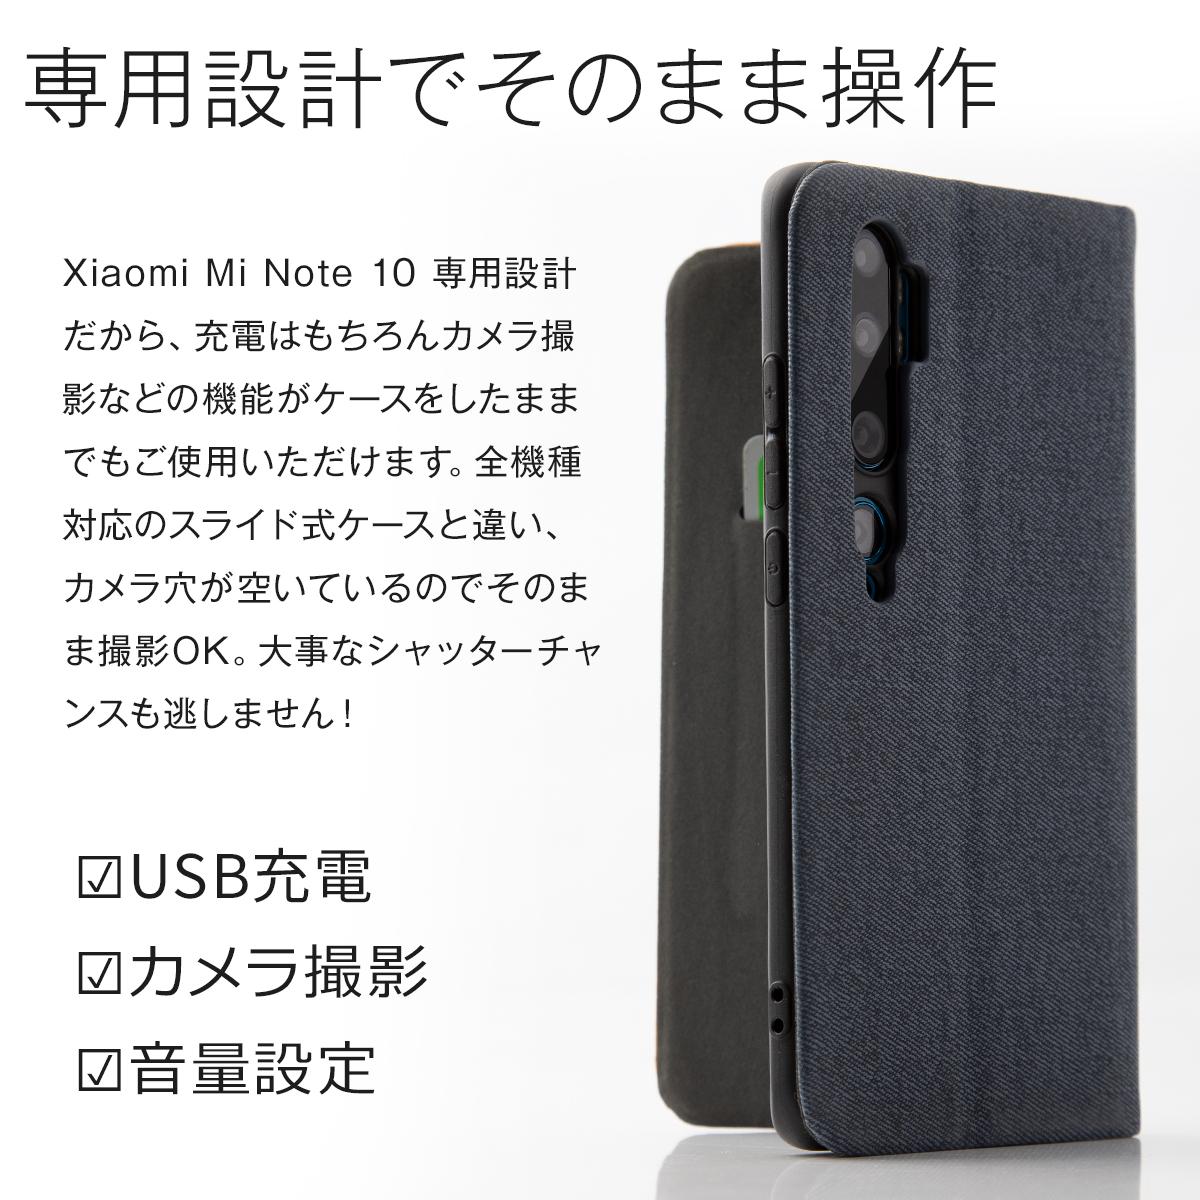 Xiaomi Mi Note 10 トリコロールカラー手帳型